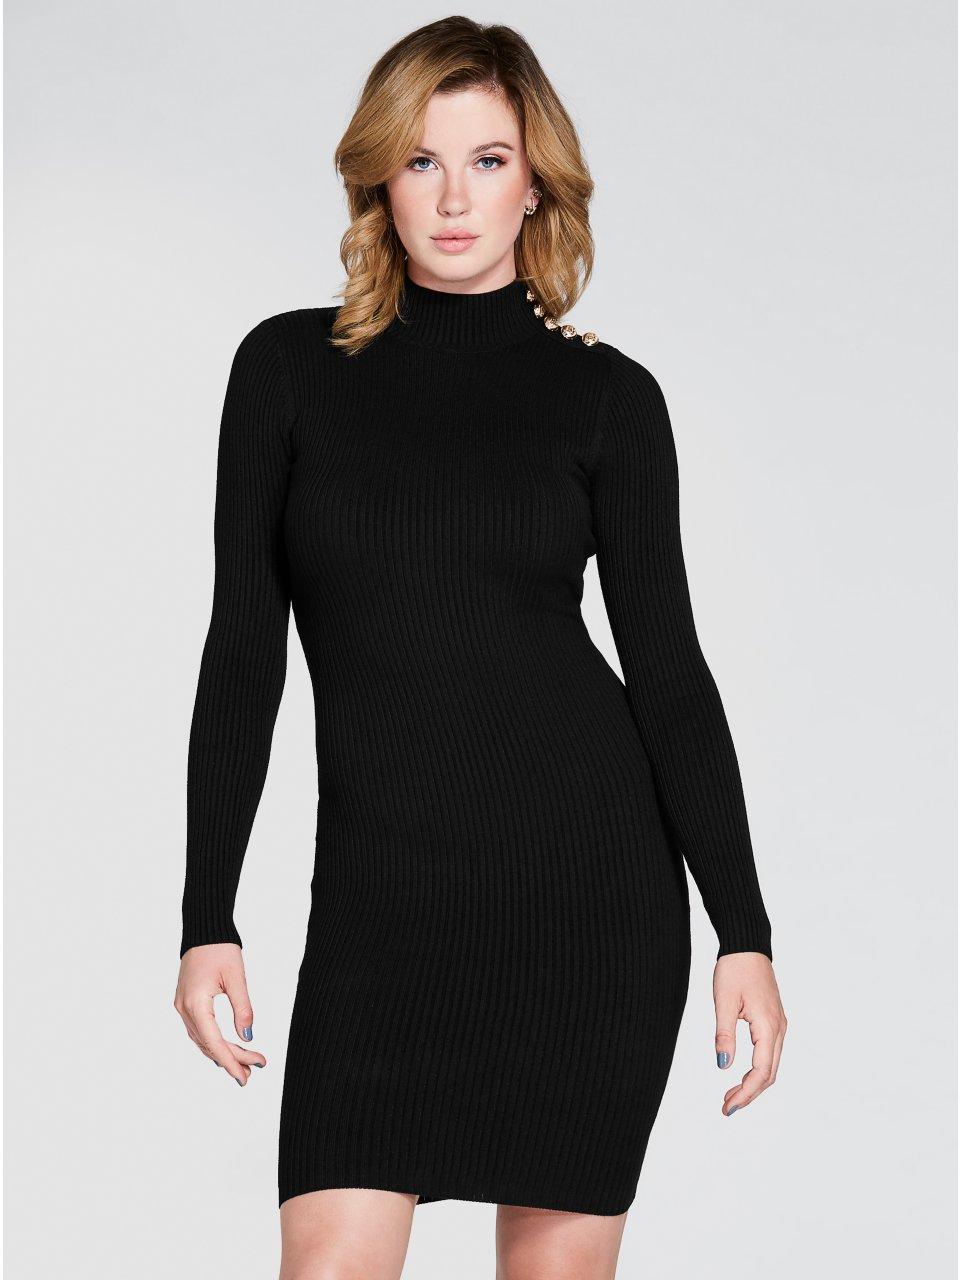 d39c55ff9ac Surha Embellished Sweater Dress